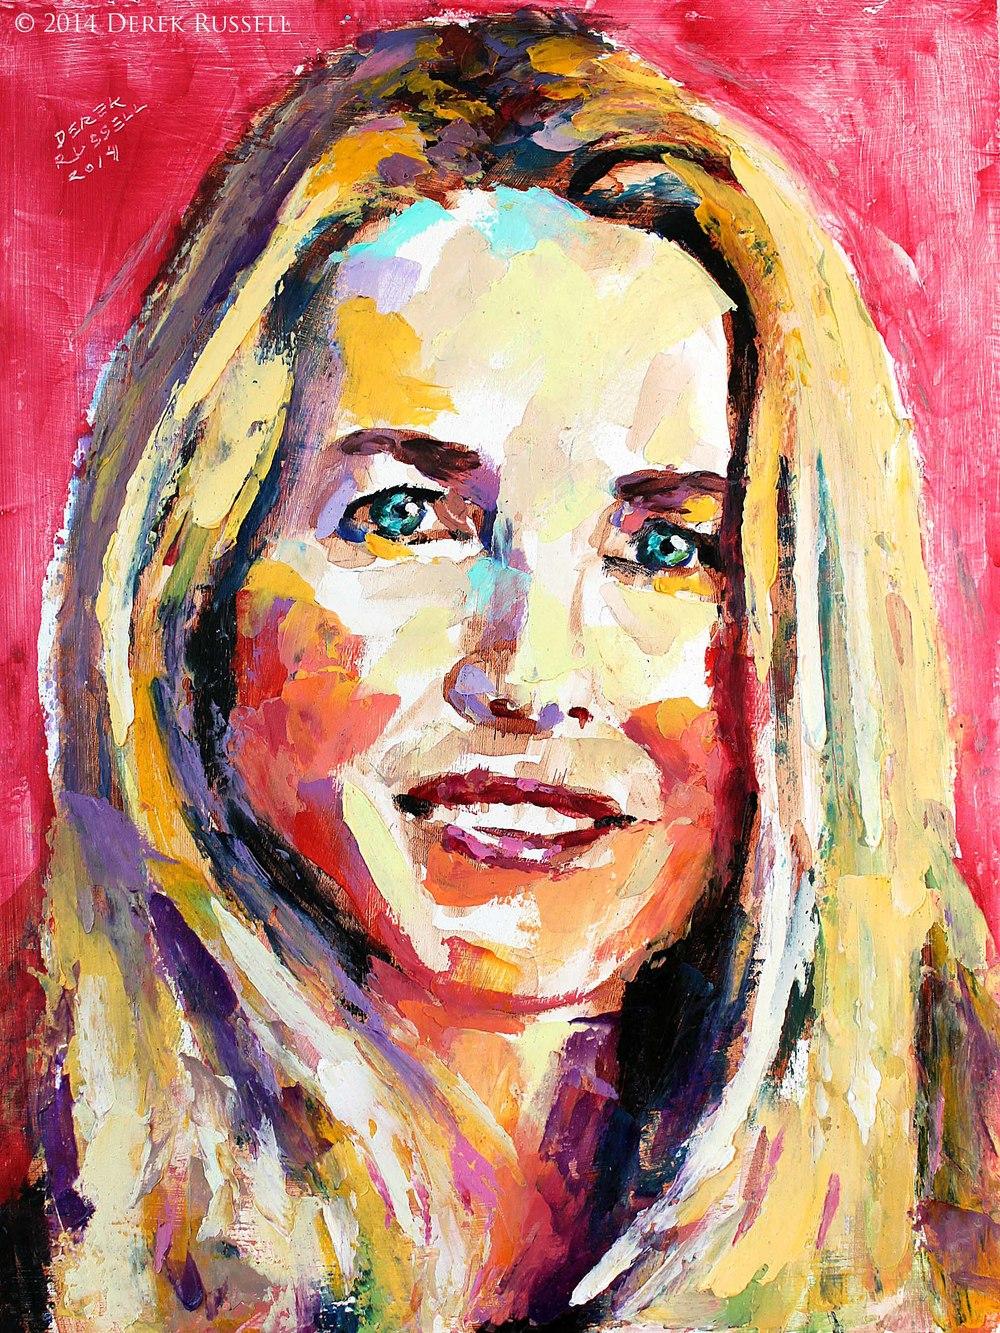 Laurene Powell Jobs Original Portrait Pop Art Painting by Derek Russell